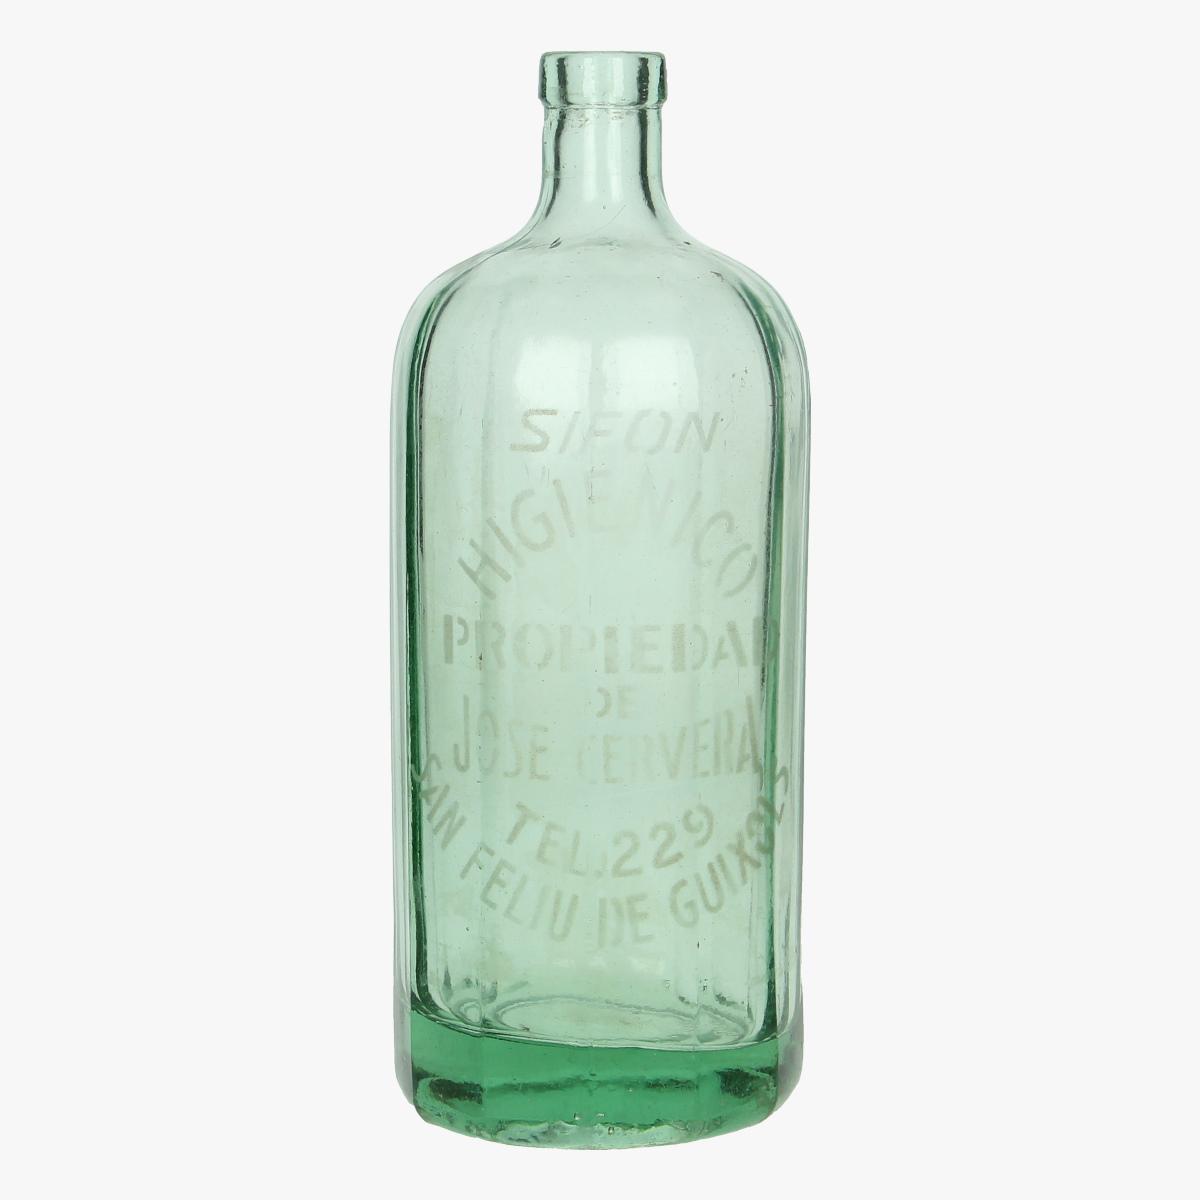 Afbeeldingen van oude soda fles san feliu de guixols sifon higienico propiedad de jose cervera